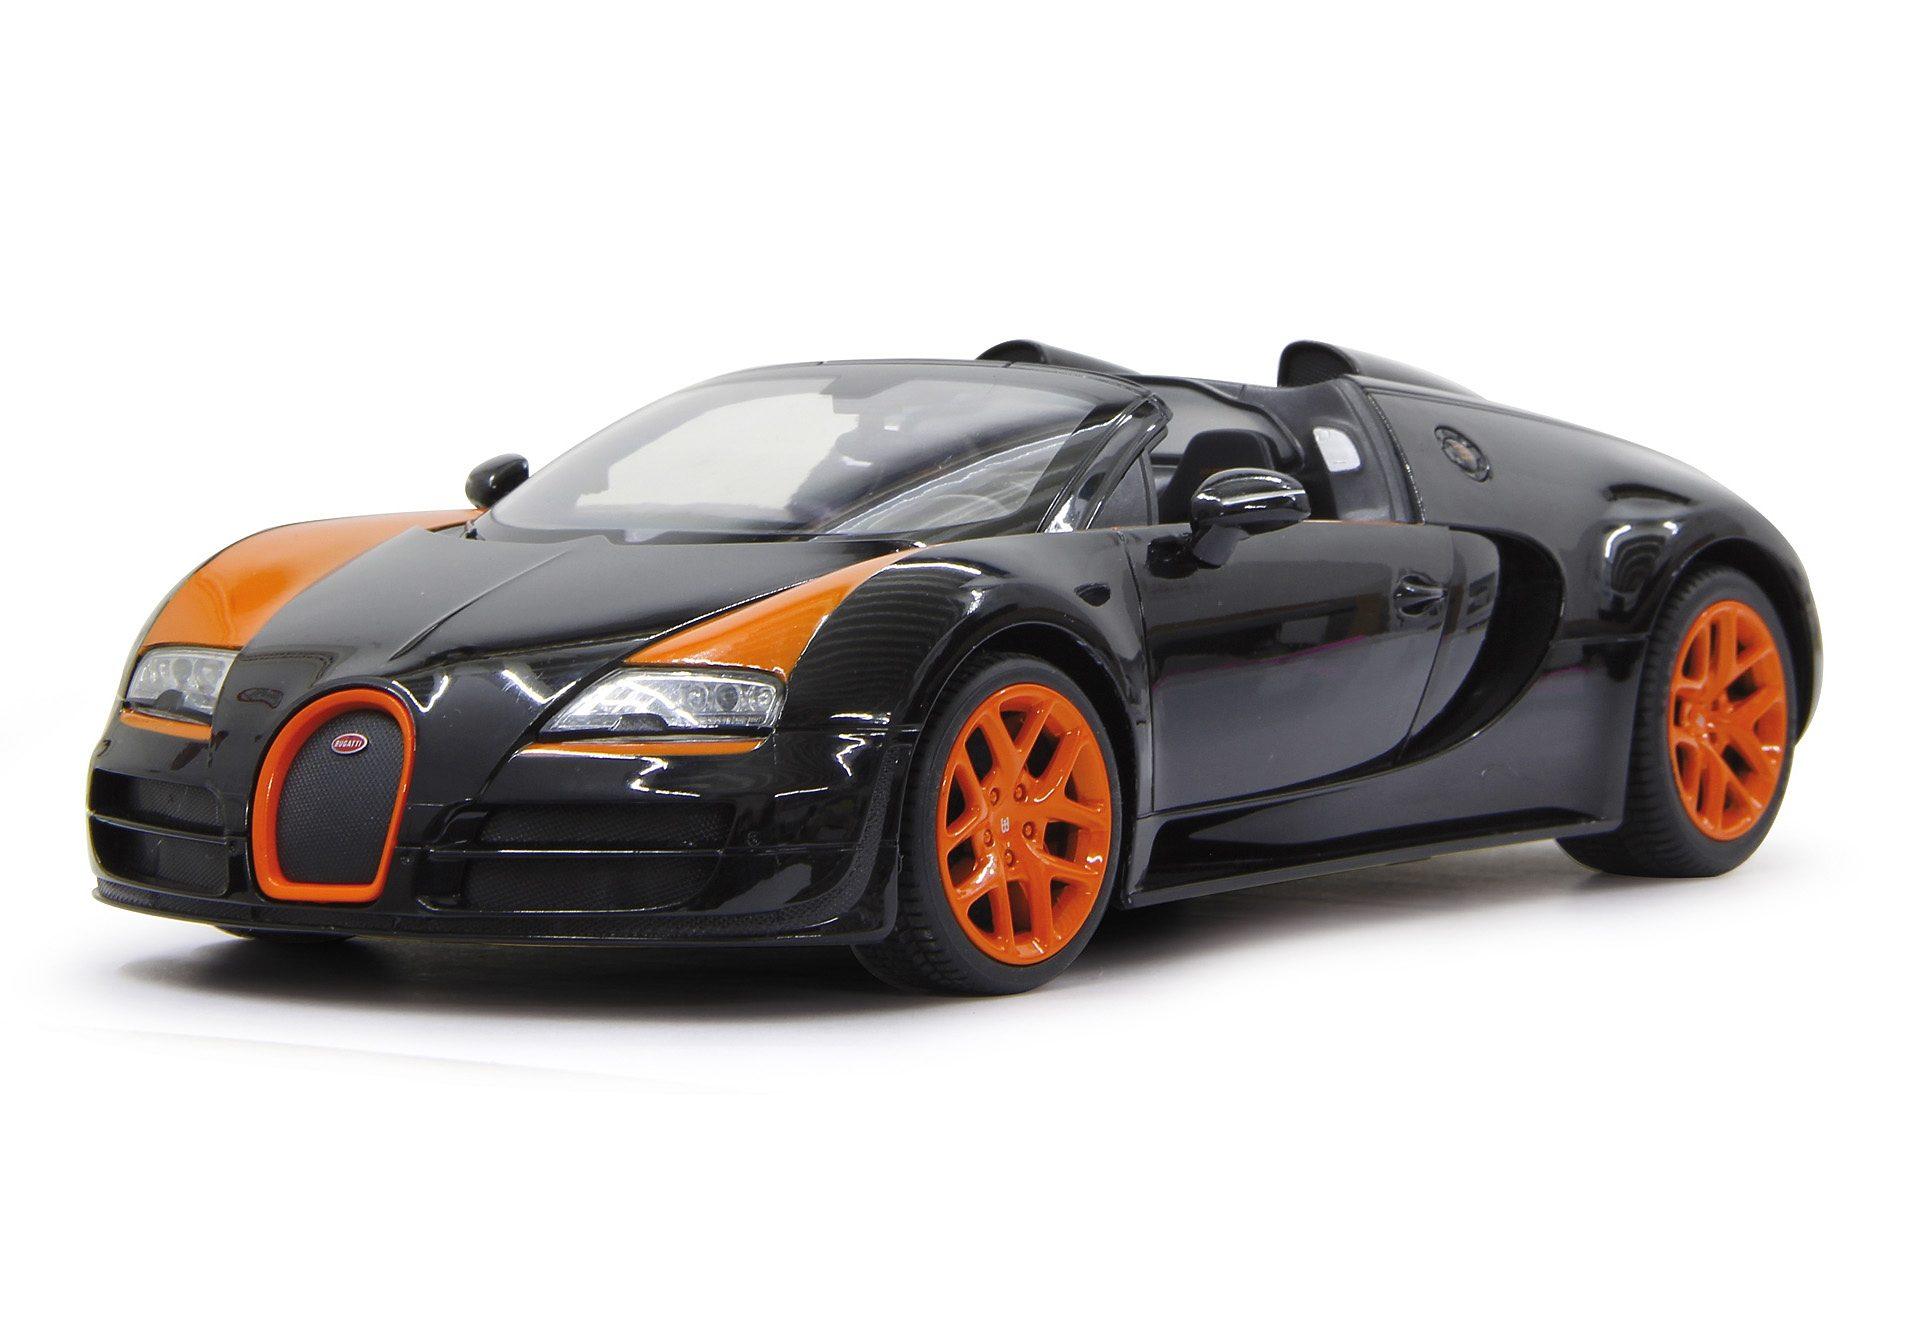 JAMARA RC Fahrzeug, »Bugatti Grand Sport Vitesse - 2,4 GHz schwarz«